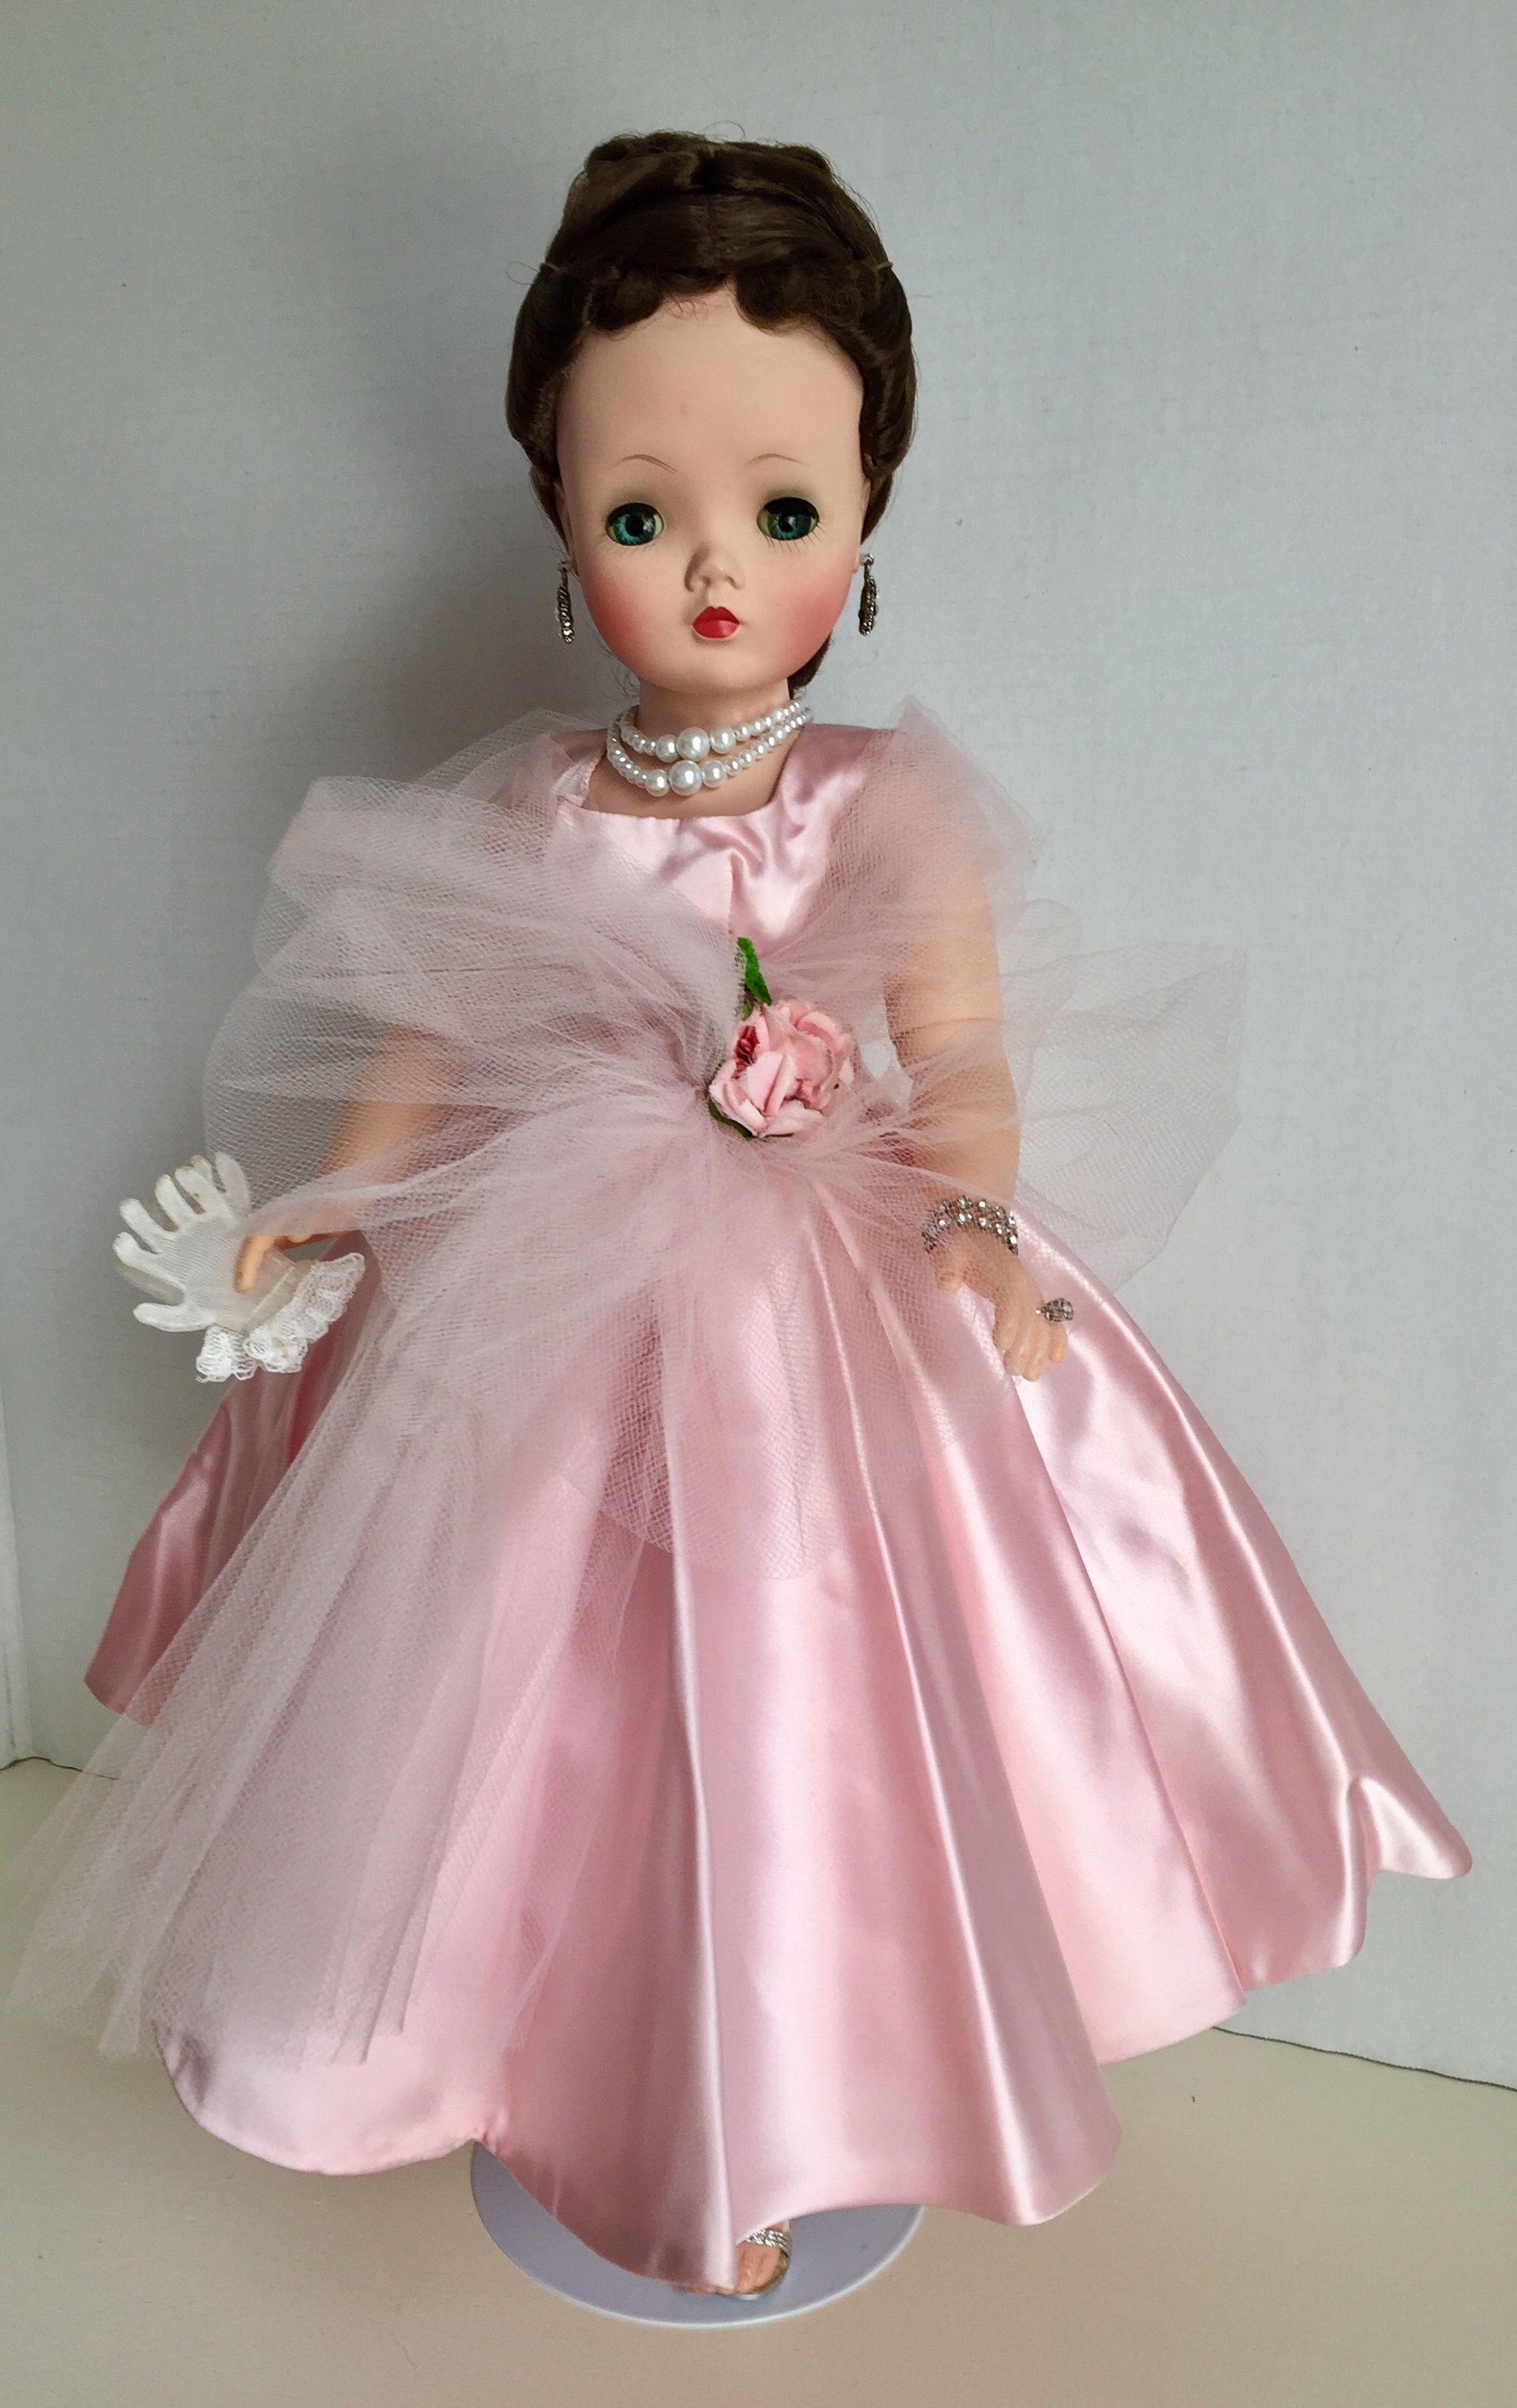 1958 pink satin dancing dress | Madame alexander dolls | Pinterest